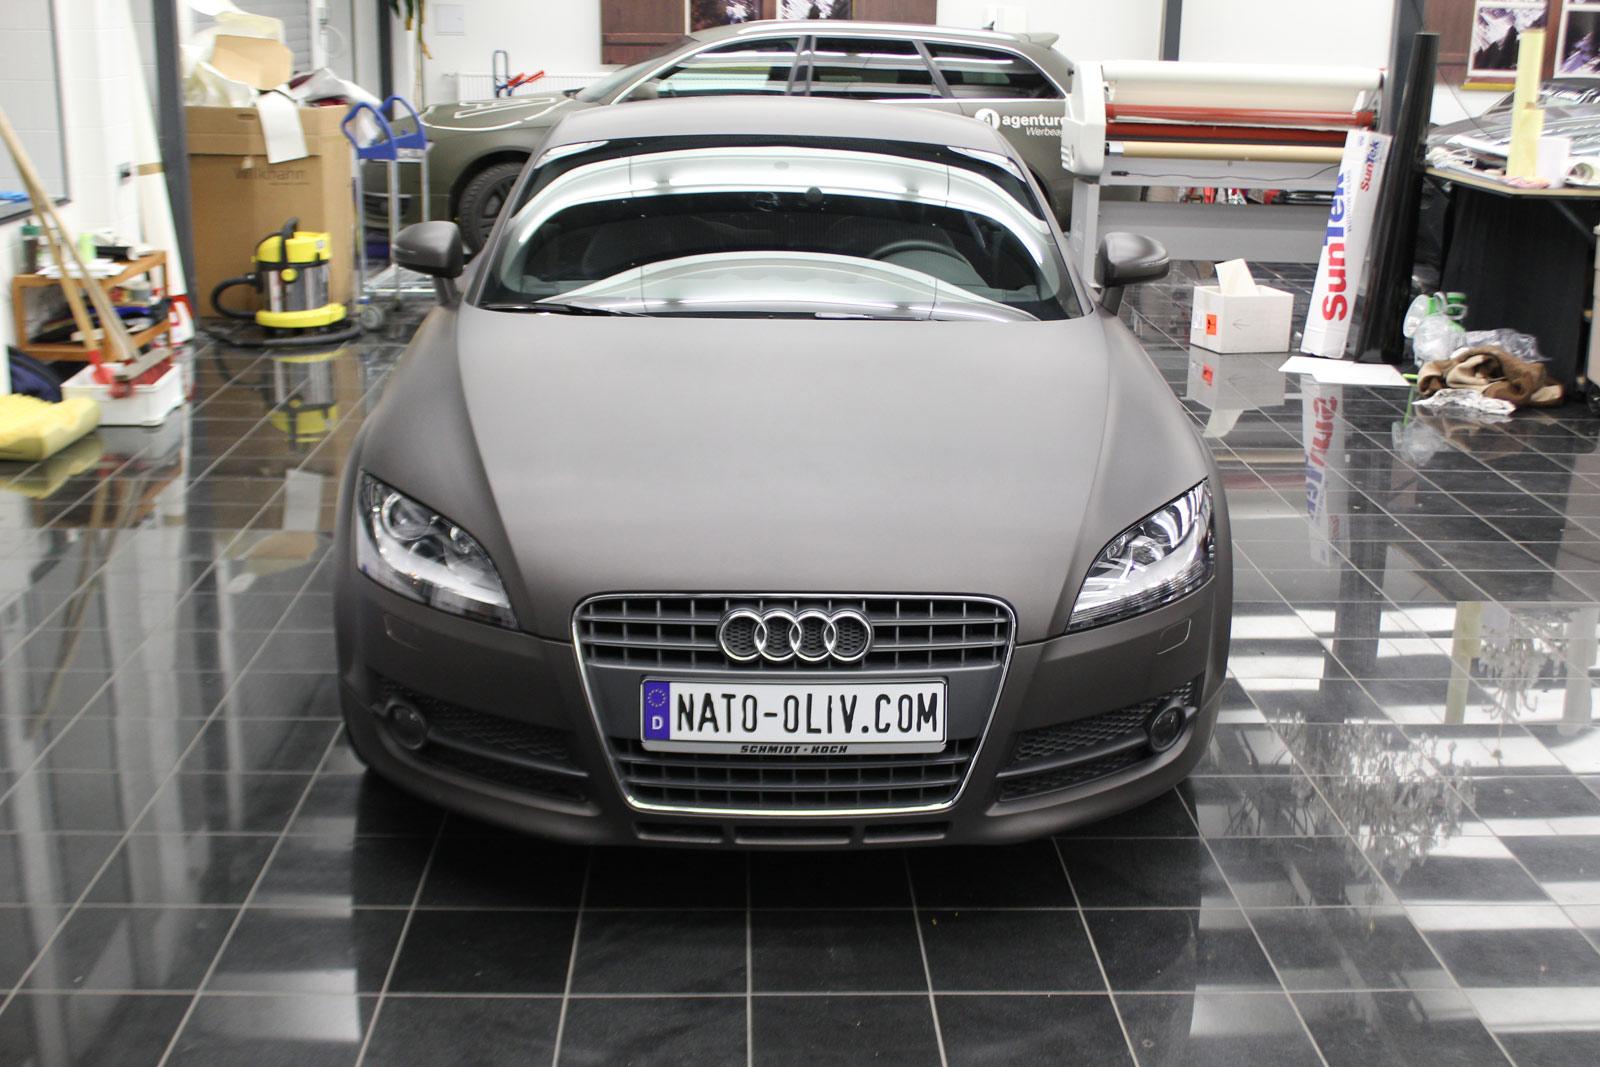 Audi_TT_Braun_Matt_Metallic_Branding_02